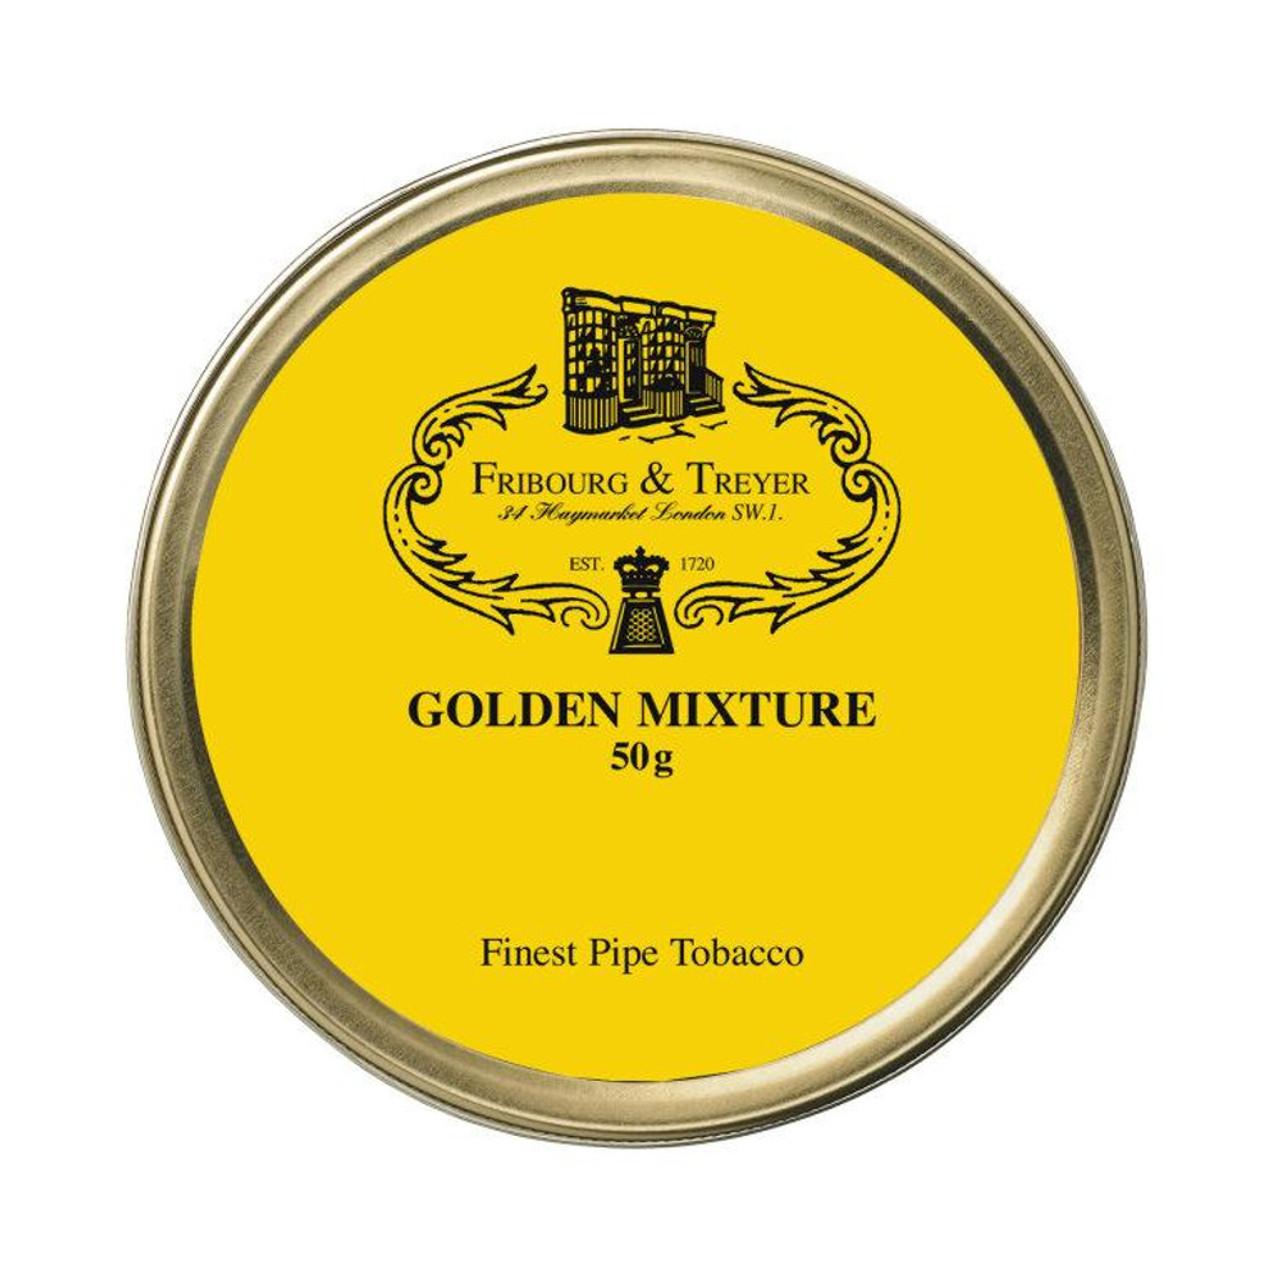 Fribourg & Treyer Golden Mixture Pipe Tobacco | 1.75 OZ TIN